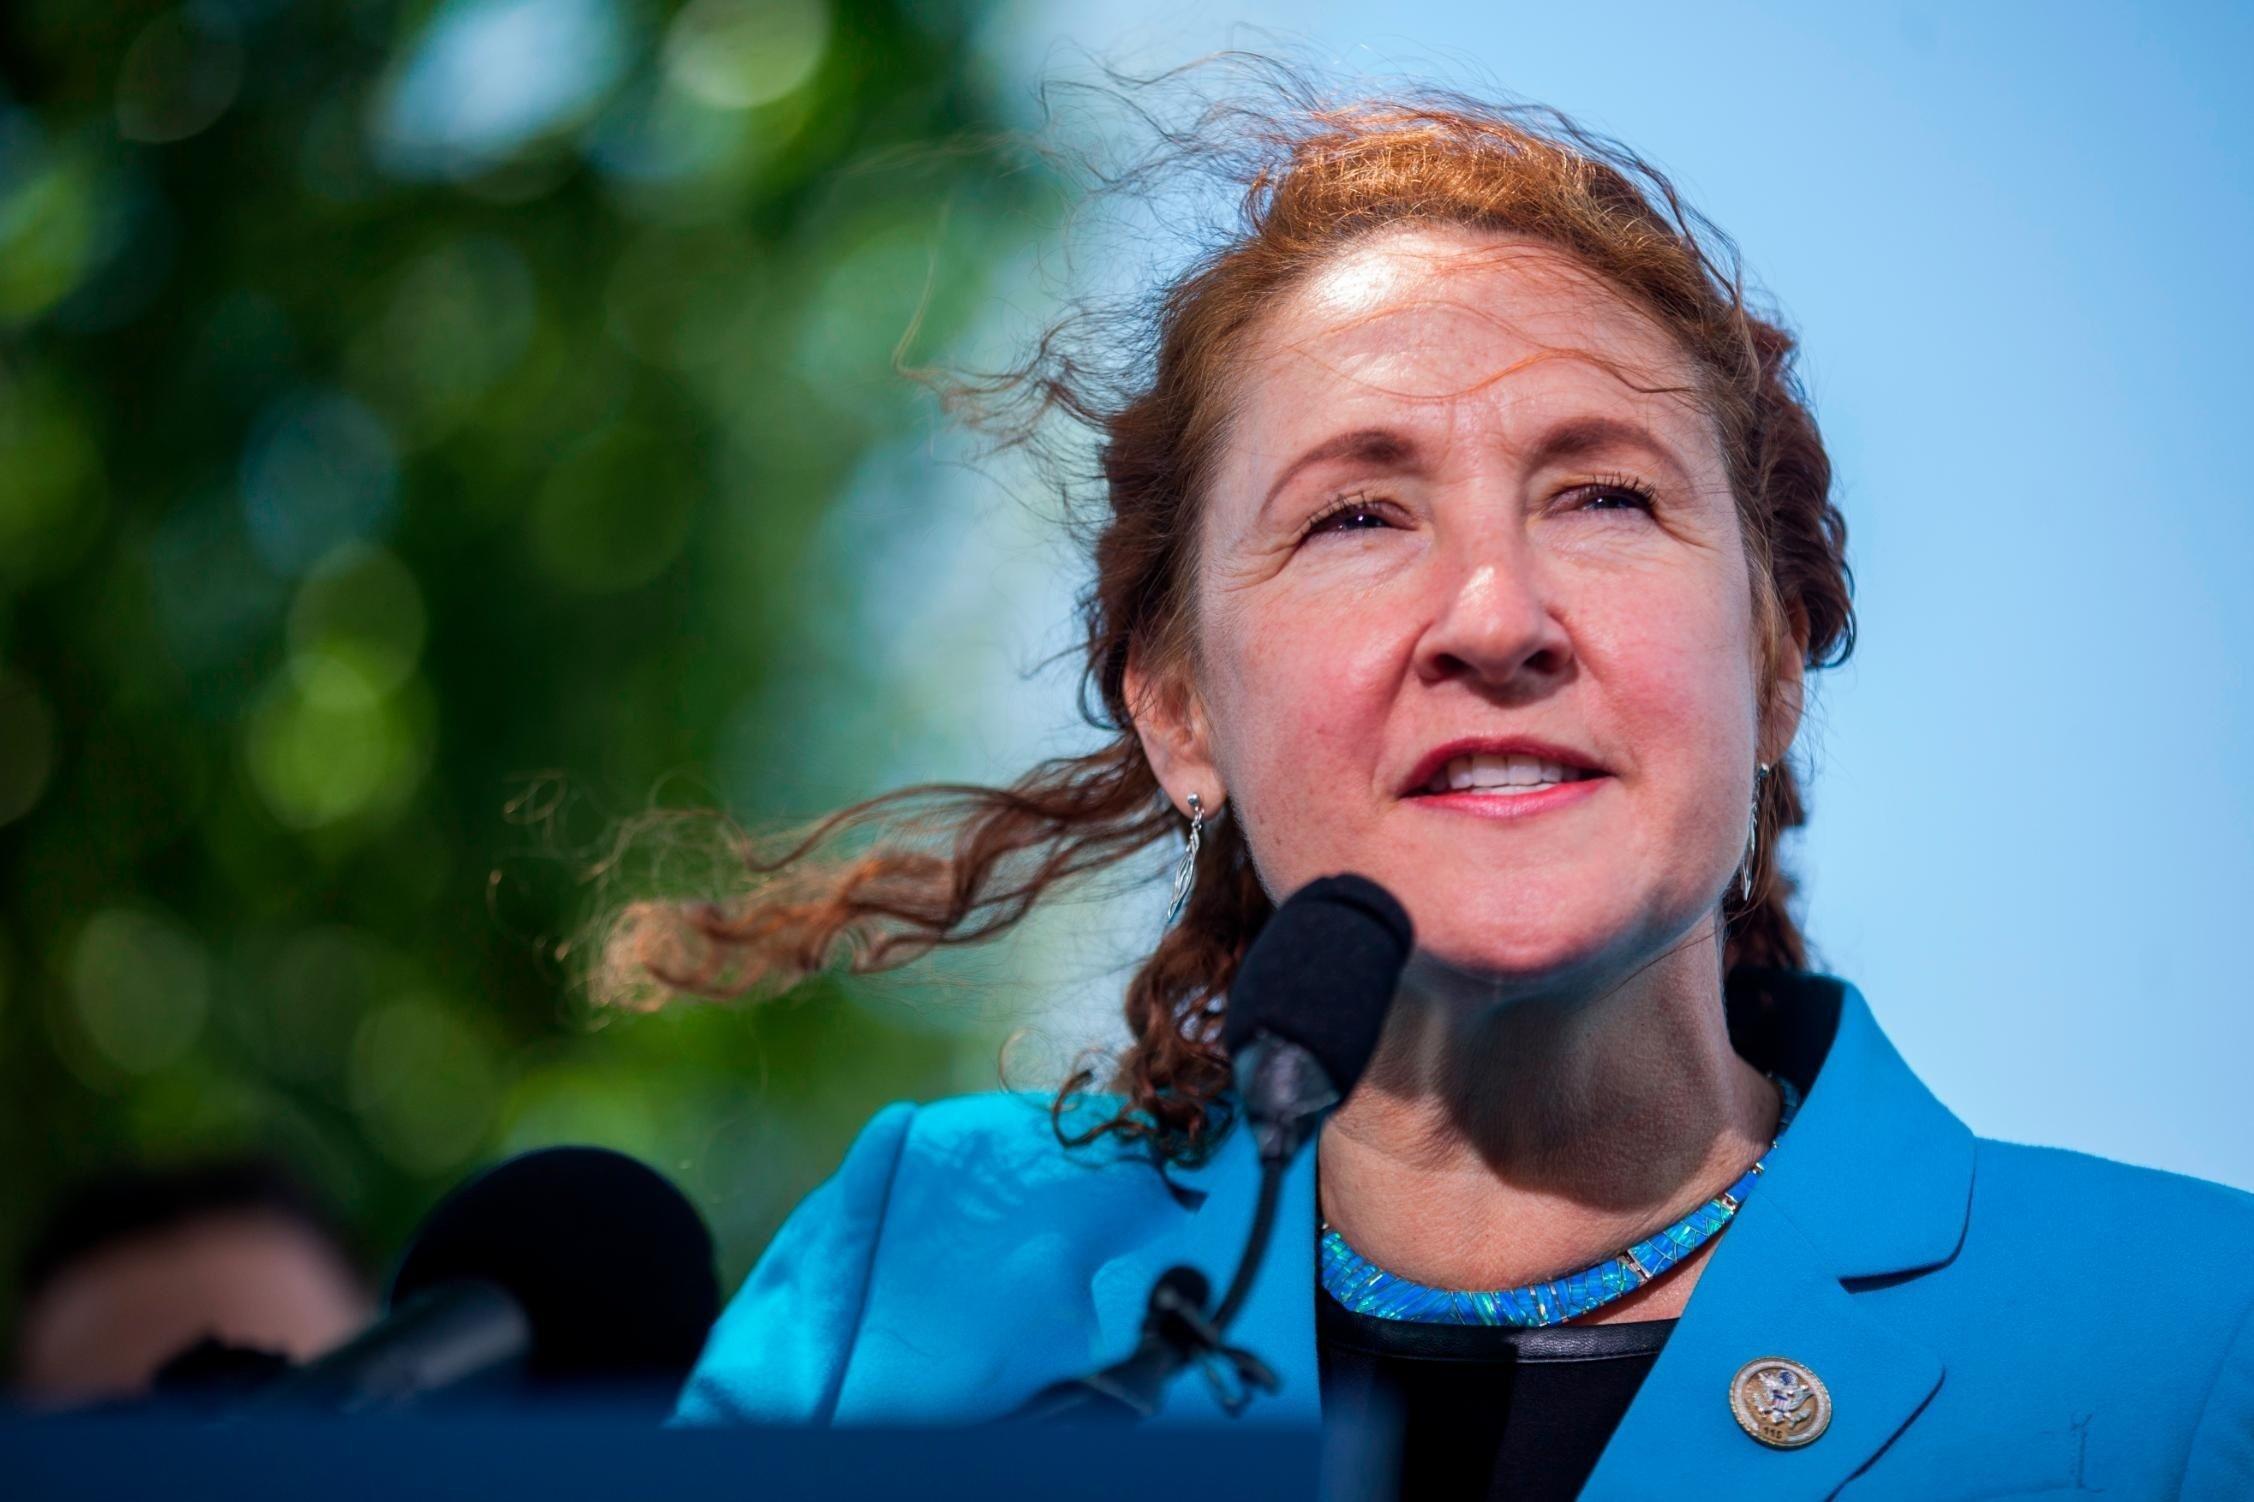 Nancy Pelosi Standing By Rep. Elizabeth Esty Amid Calls For Resignation